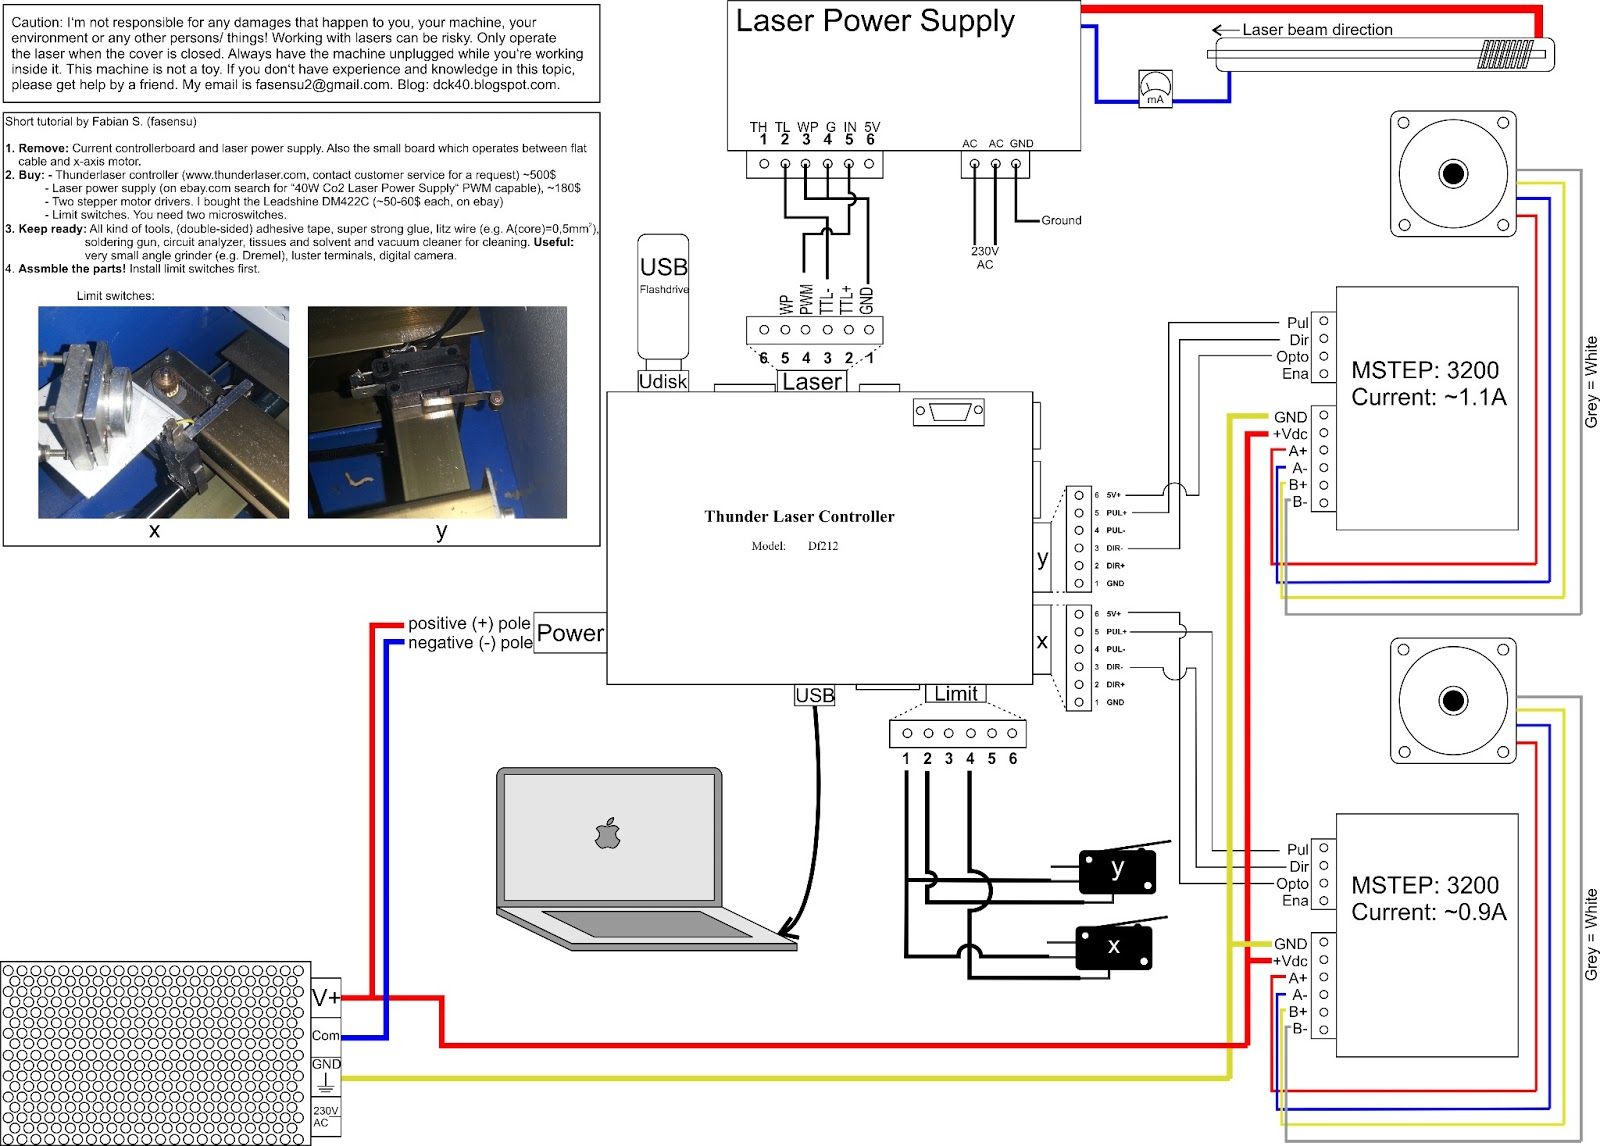 small resolution of k40 wiring diagram wiring diagram operationsk40 fuse diagram wiring diagram show k40 radar wiring diagram k40